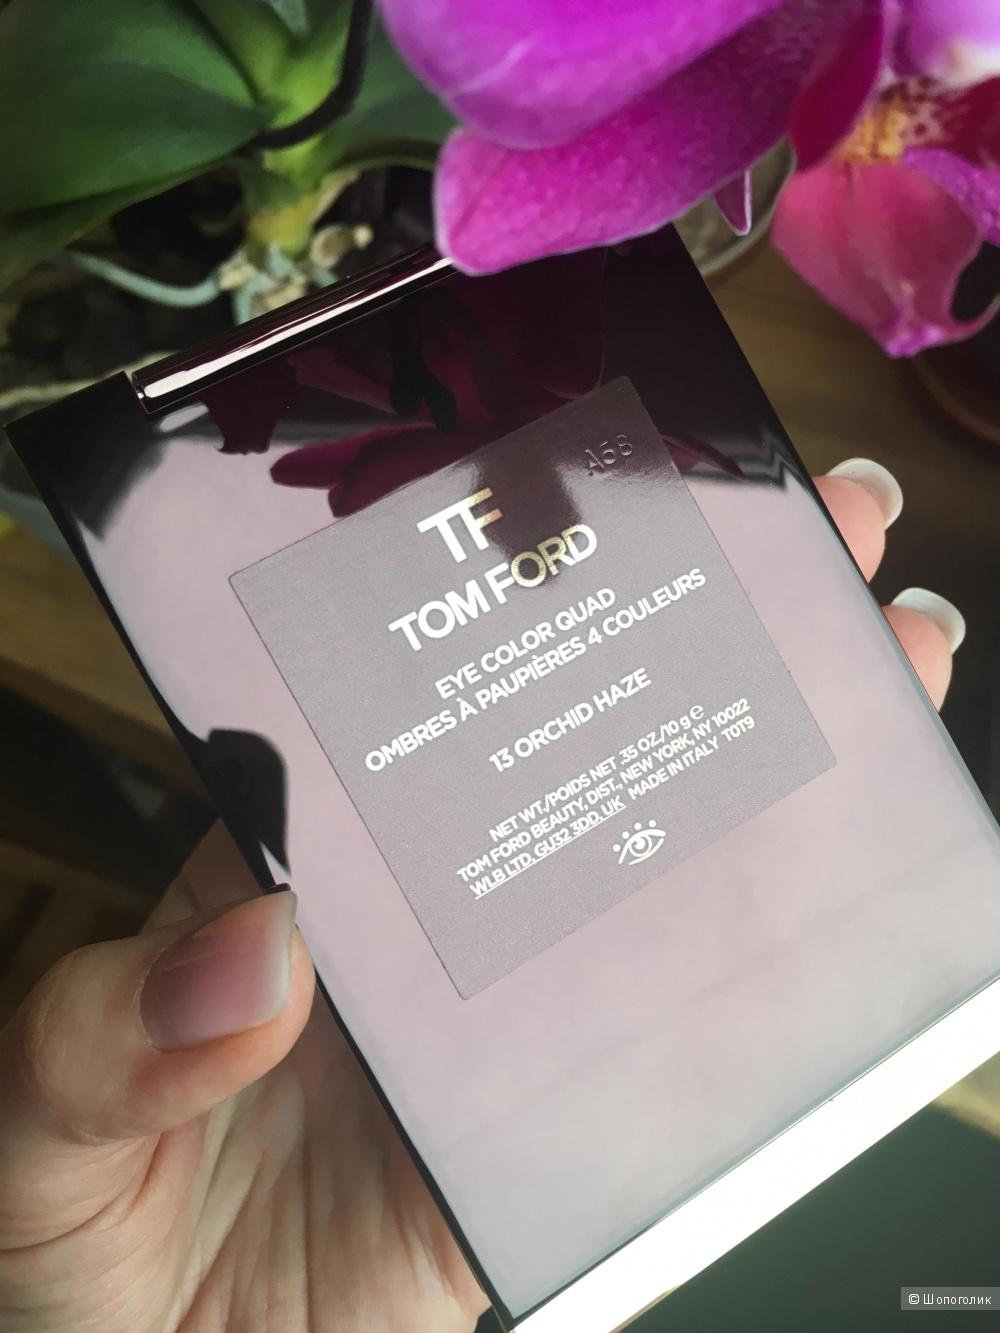 Tom Ford Палетка теней, тон: Orchid haze. One size.